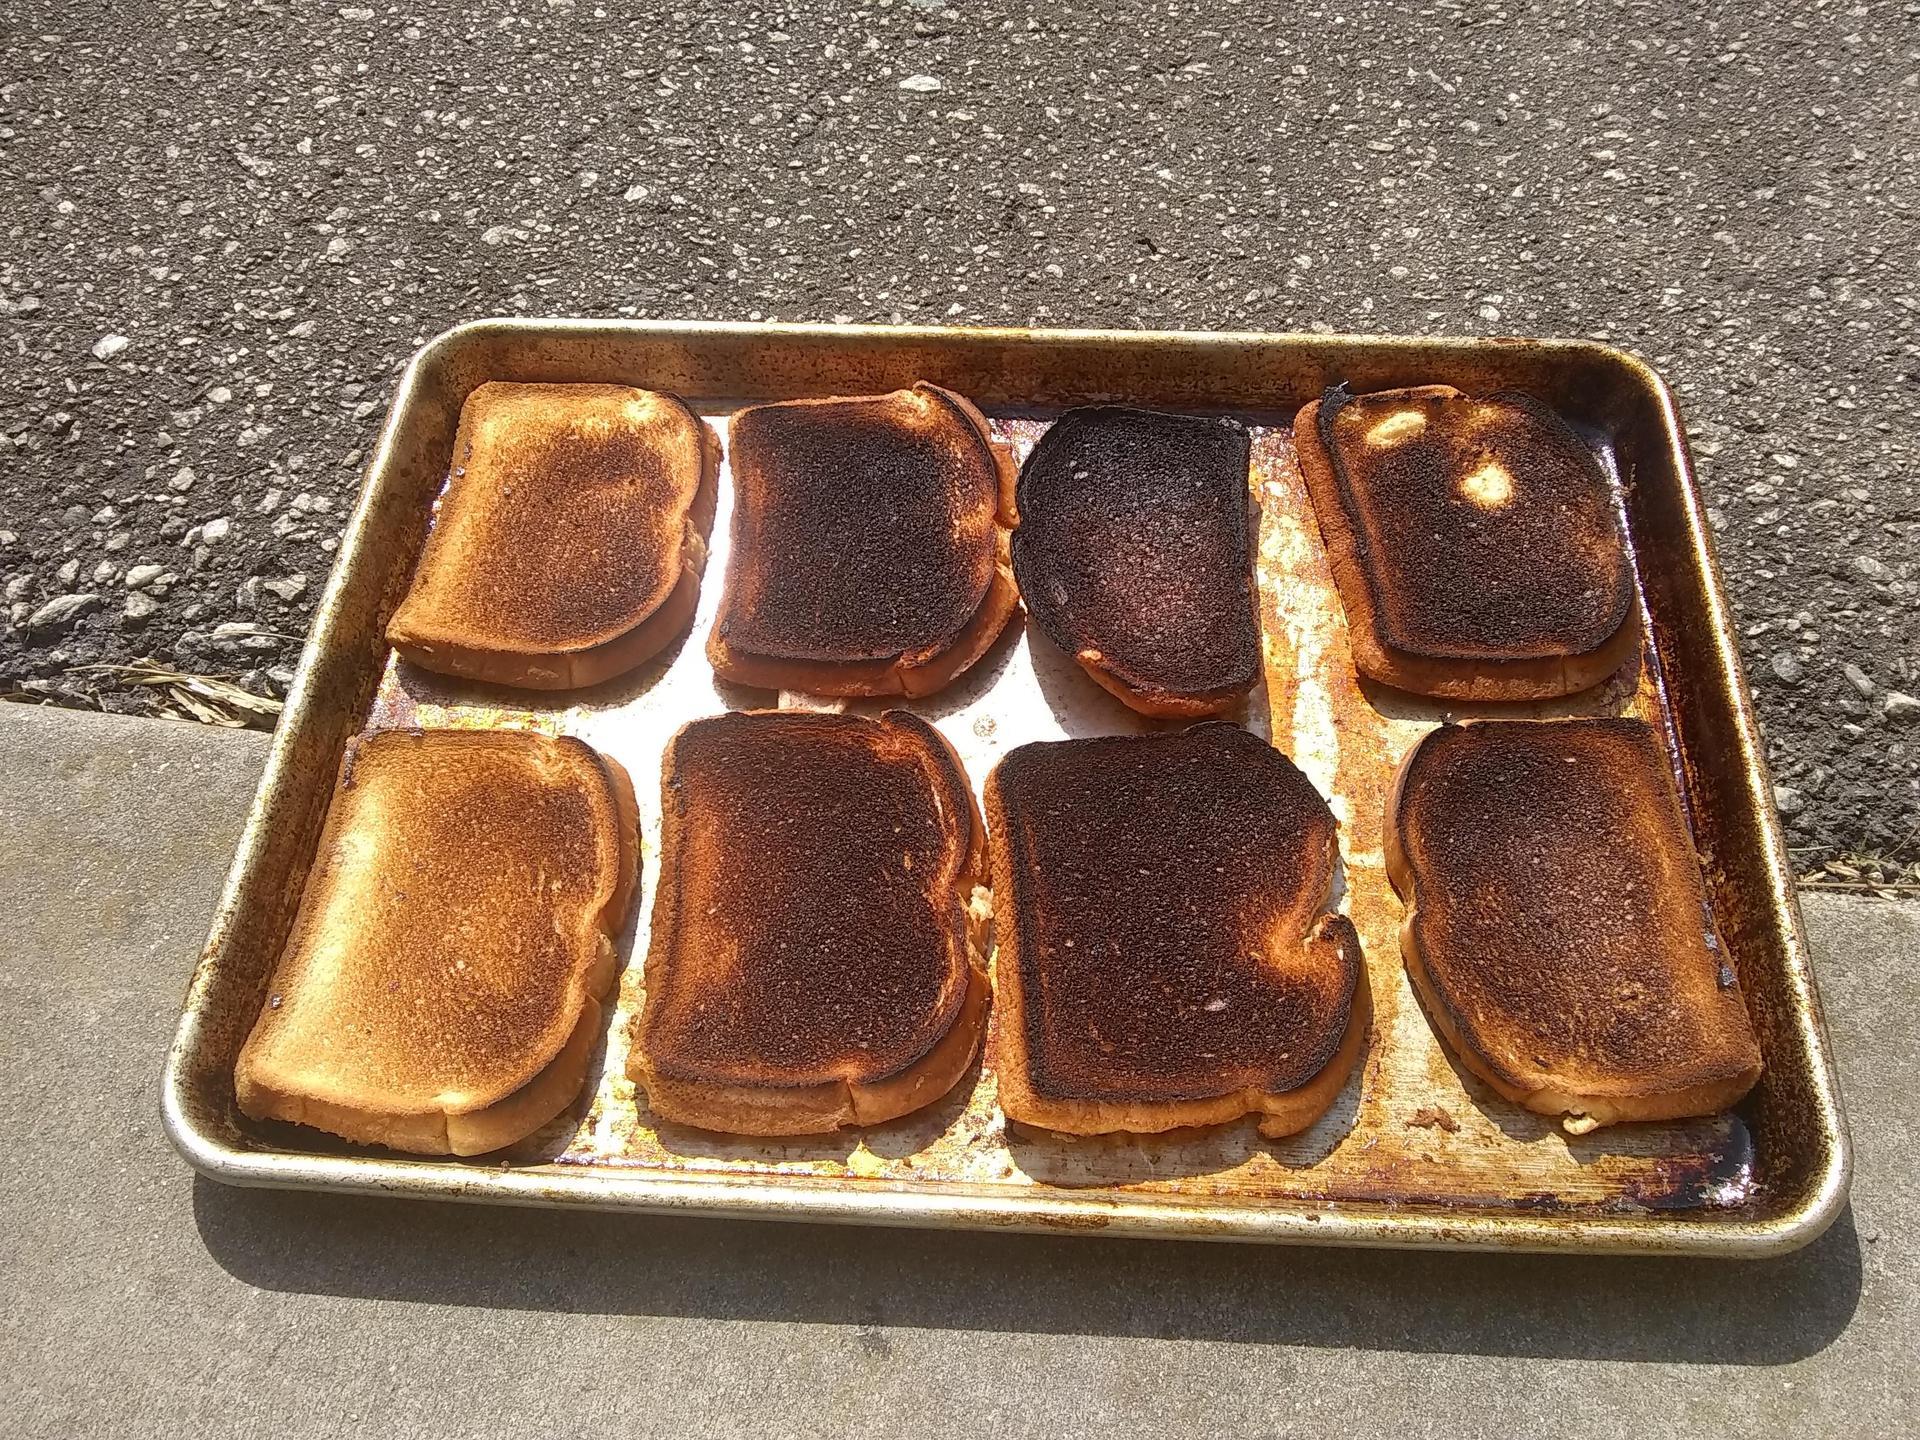 a pan of burned toast